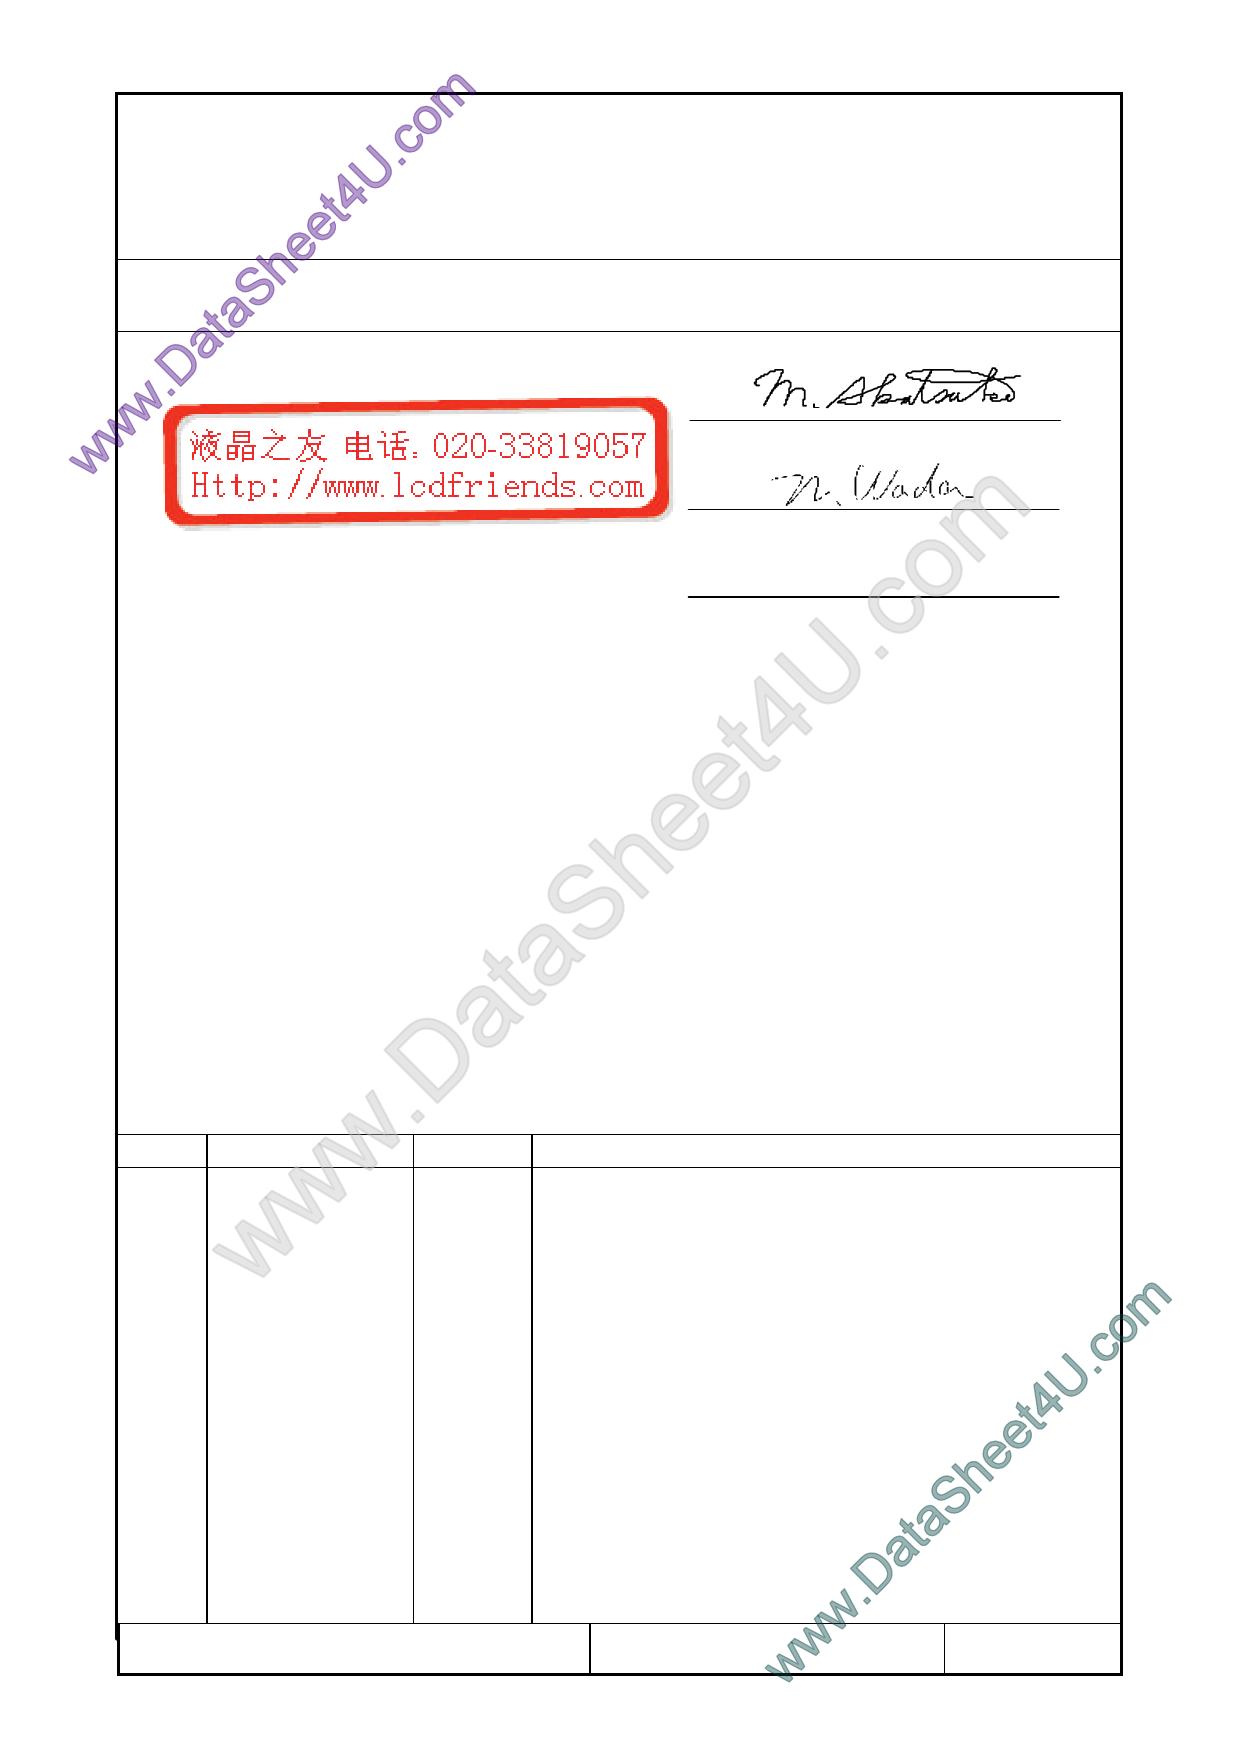 F-51854GNFJ-SLW-ABN دیتاشیت PDF